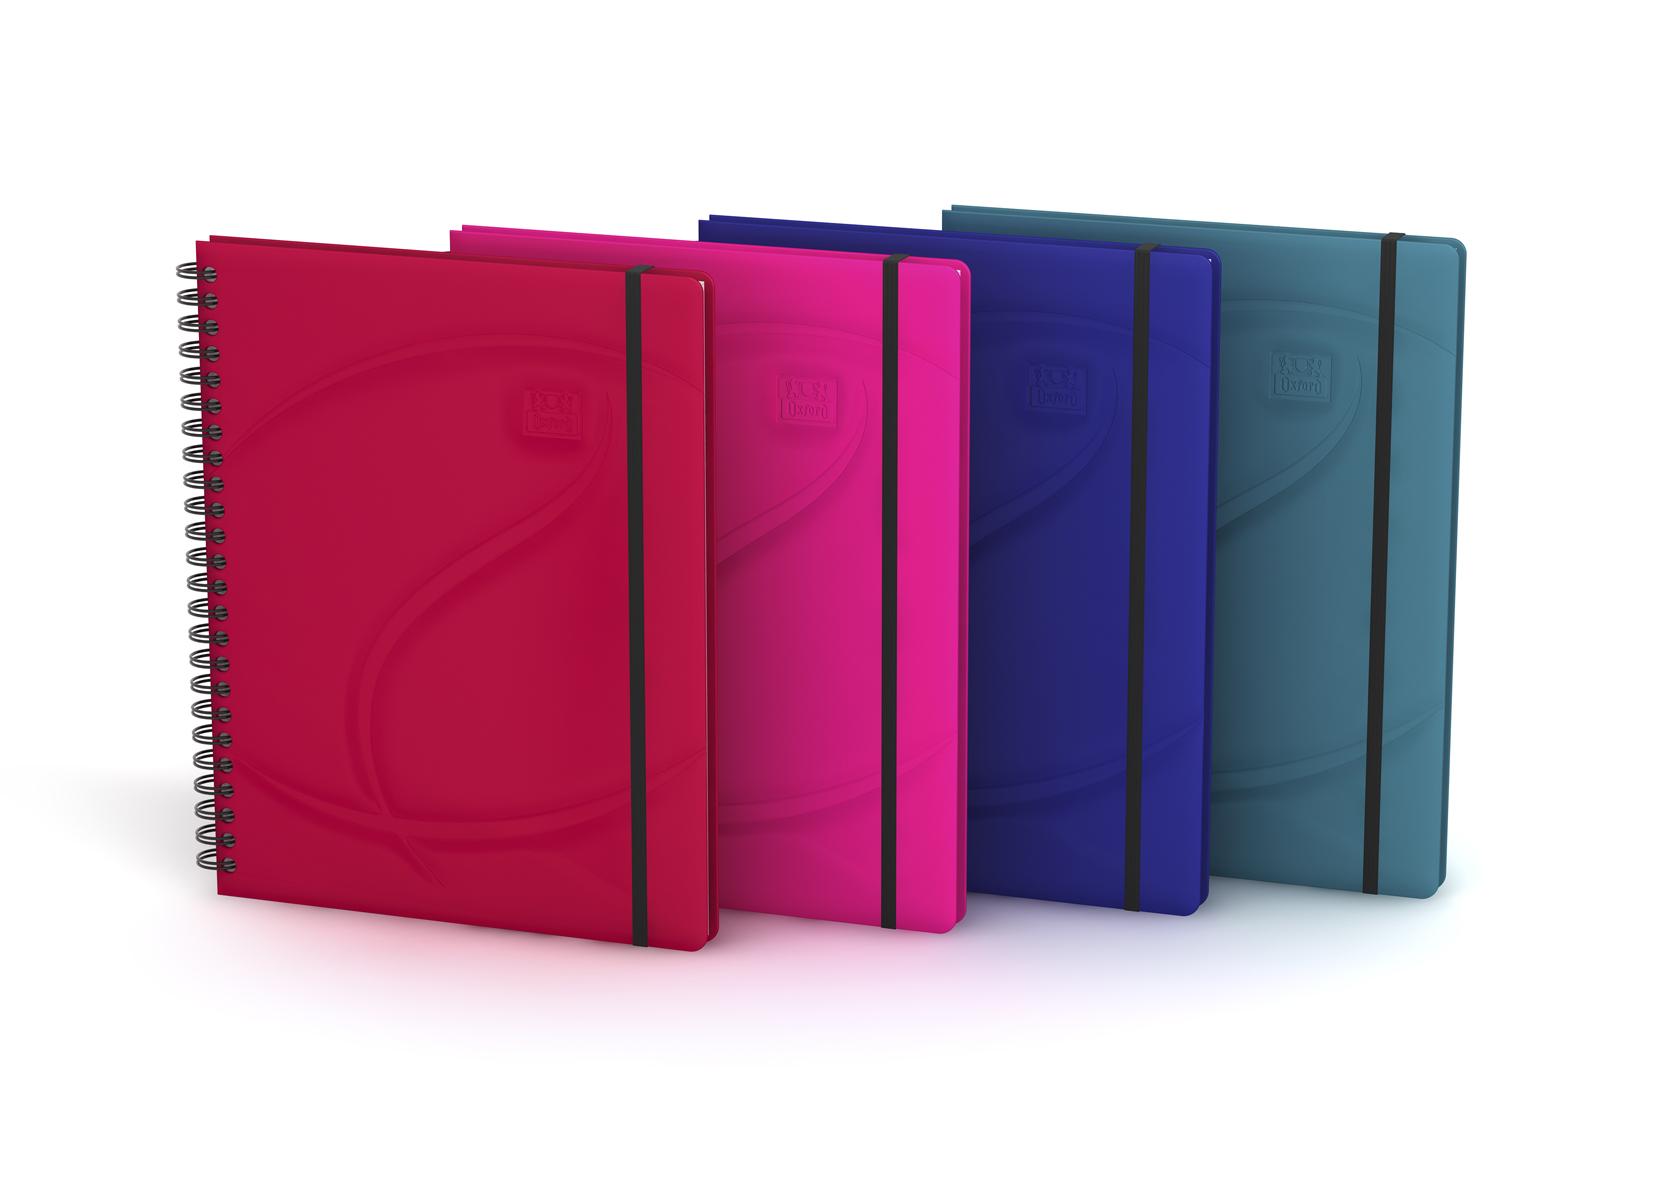 ¡SORTEO! Súper Kit de cuadernos Oxford!